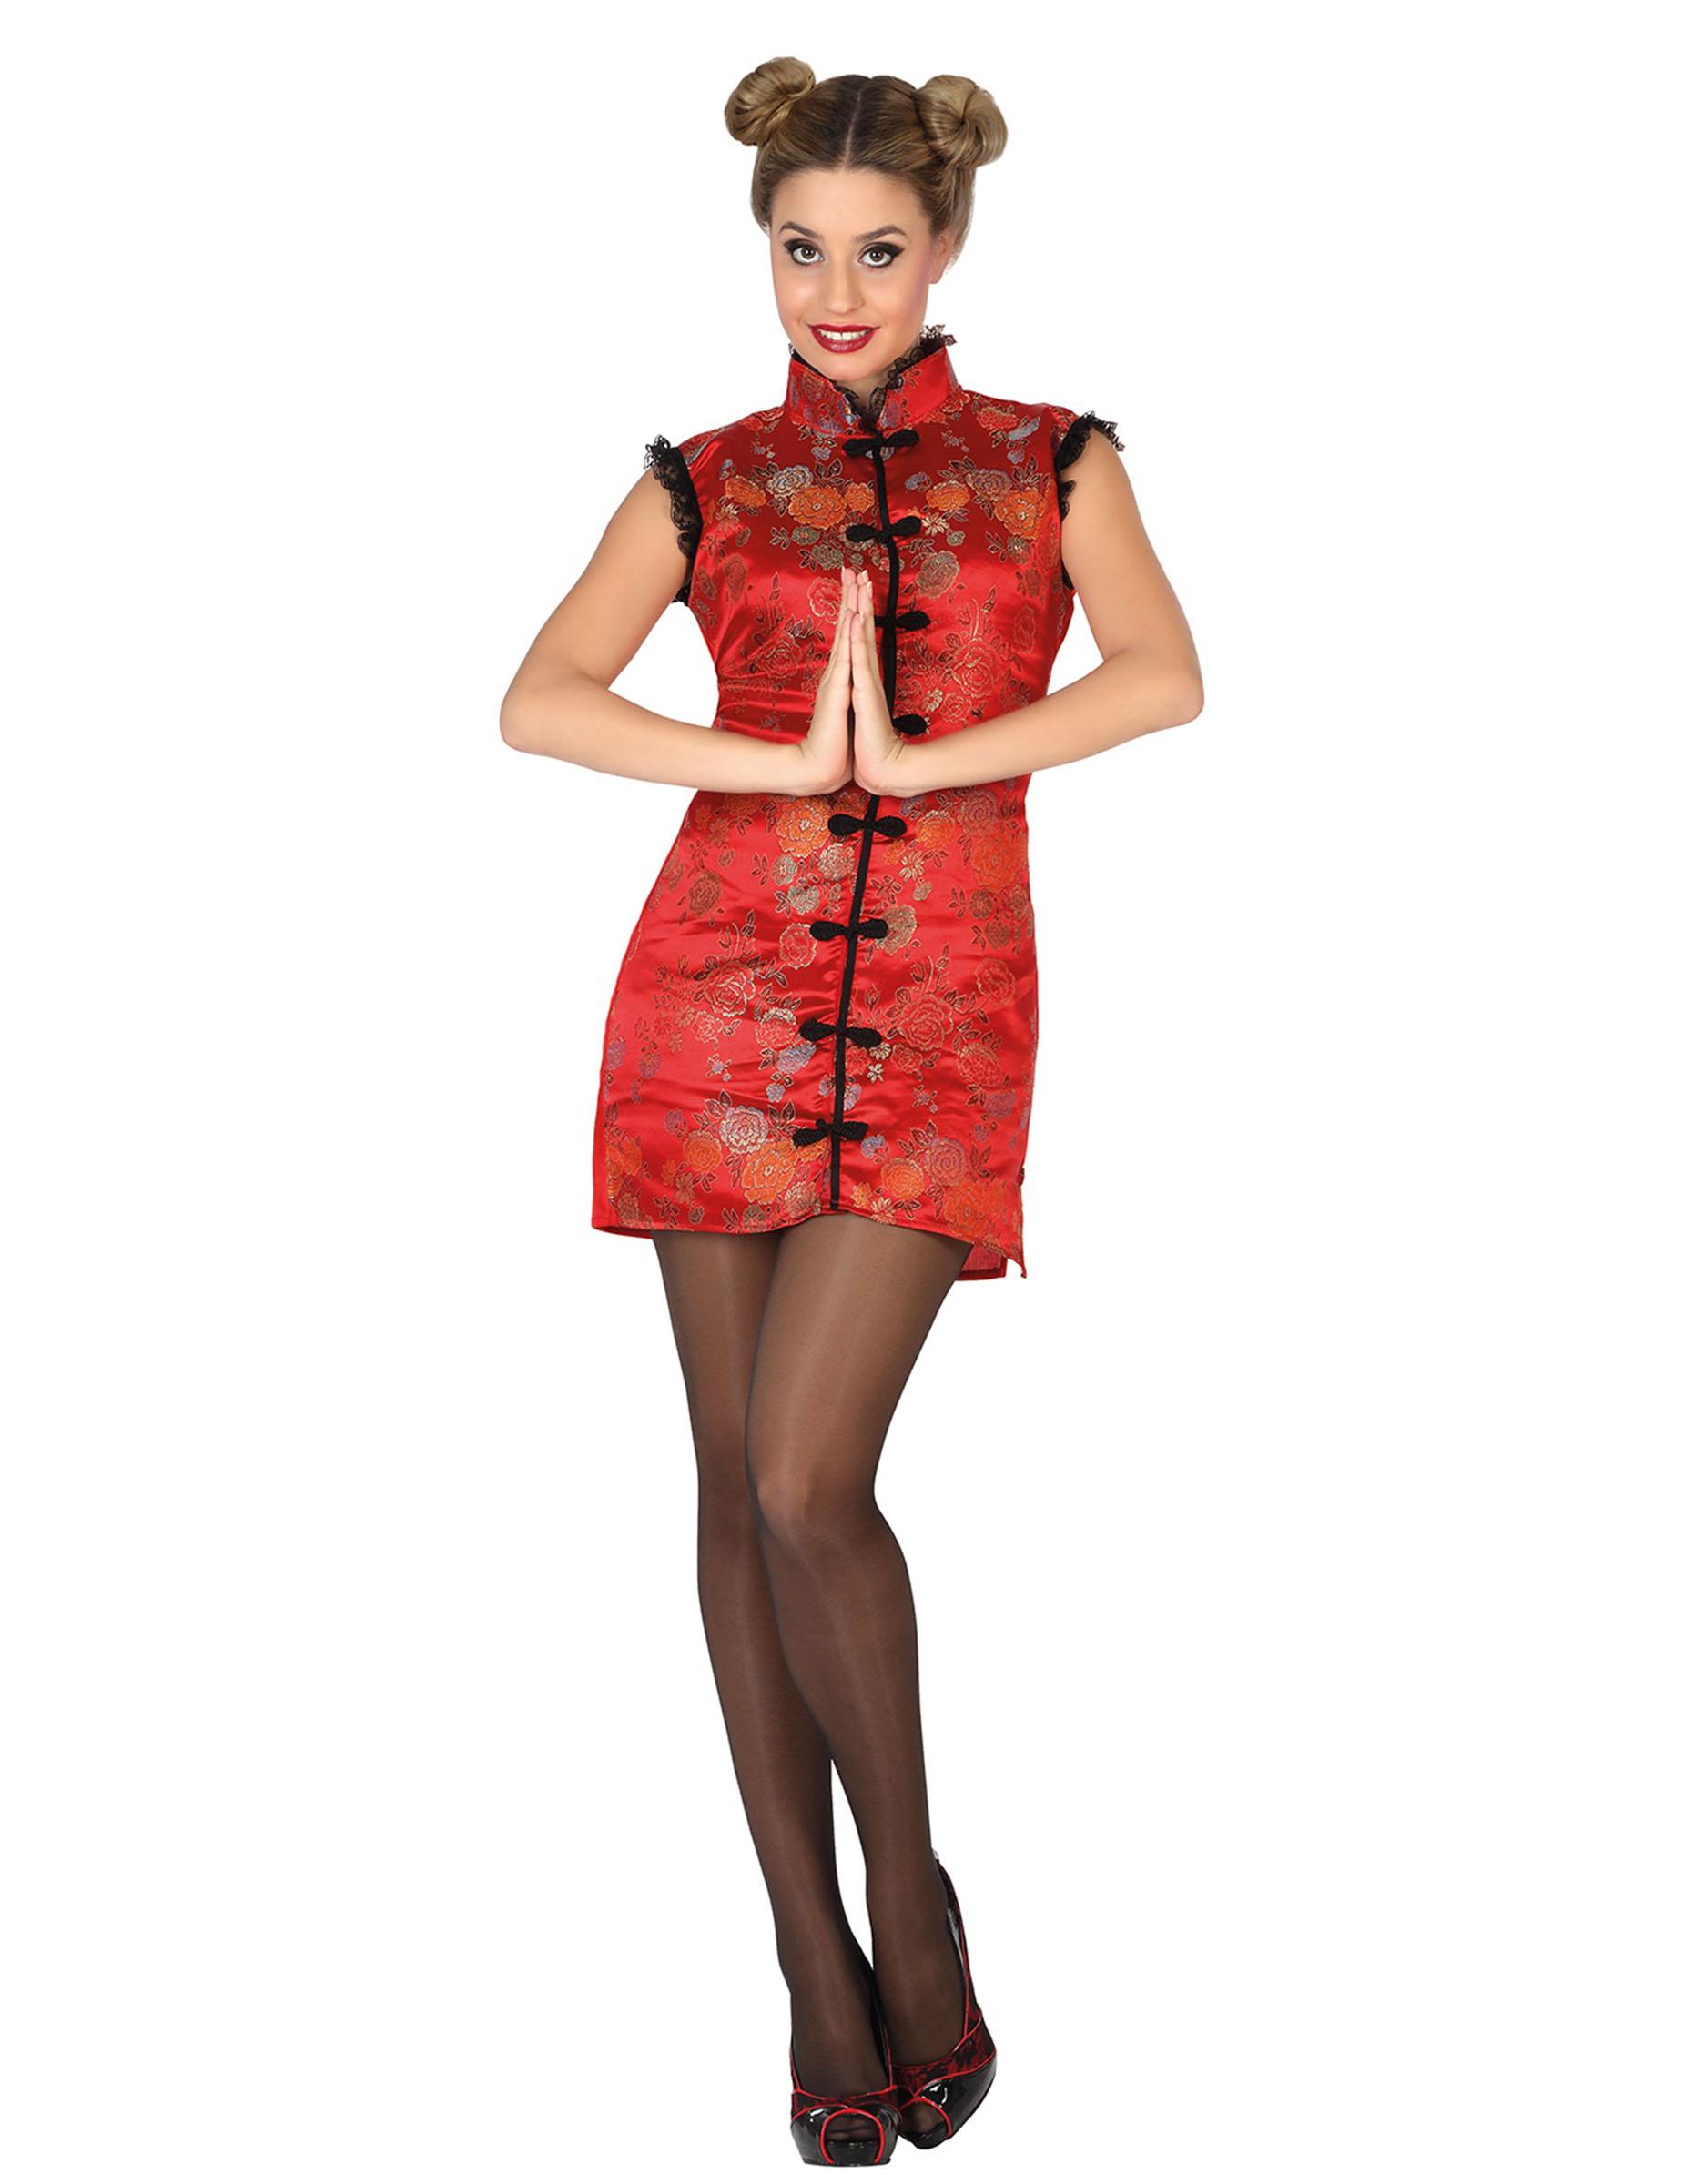 elegante chinesin damenkost m asiatin rot g nstige faschings kost me bei karneval megastore. Black Bedroom Furniture Sets. Home Design Ideas